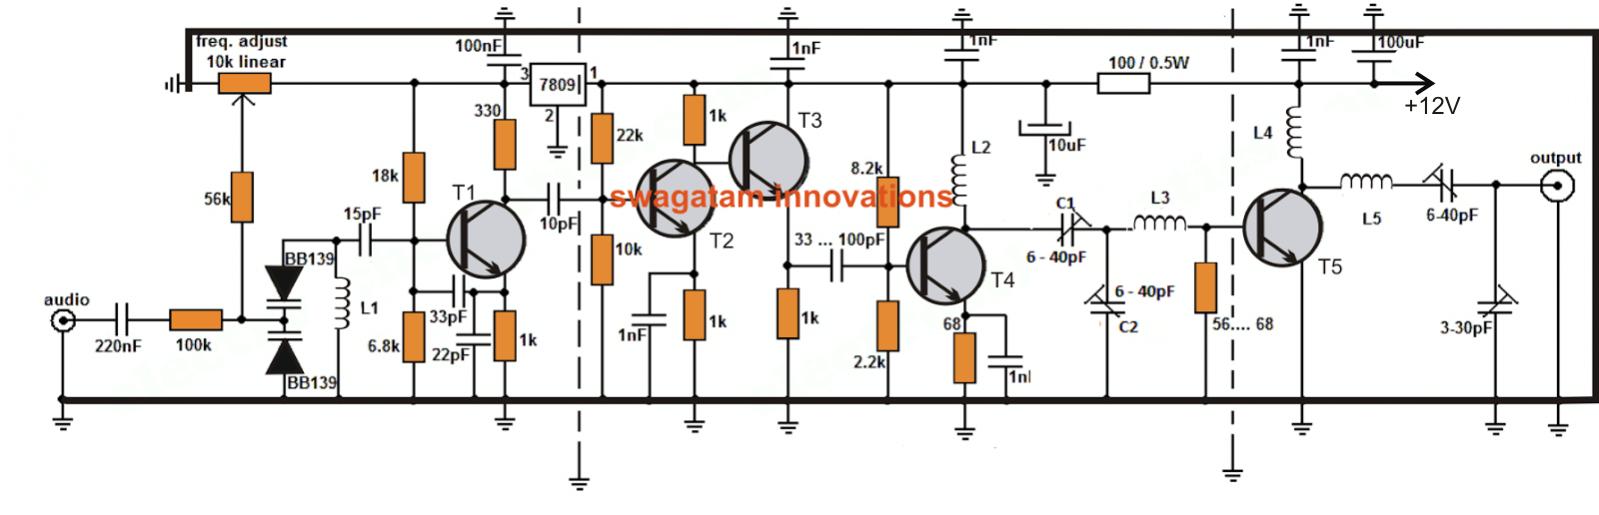 how to make circuit diagrams the wiring diagram circuit diagram of metal detector project vidim wiring diagram circuit diagram